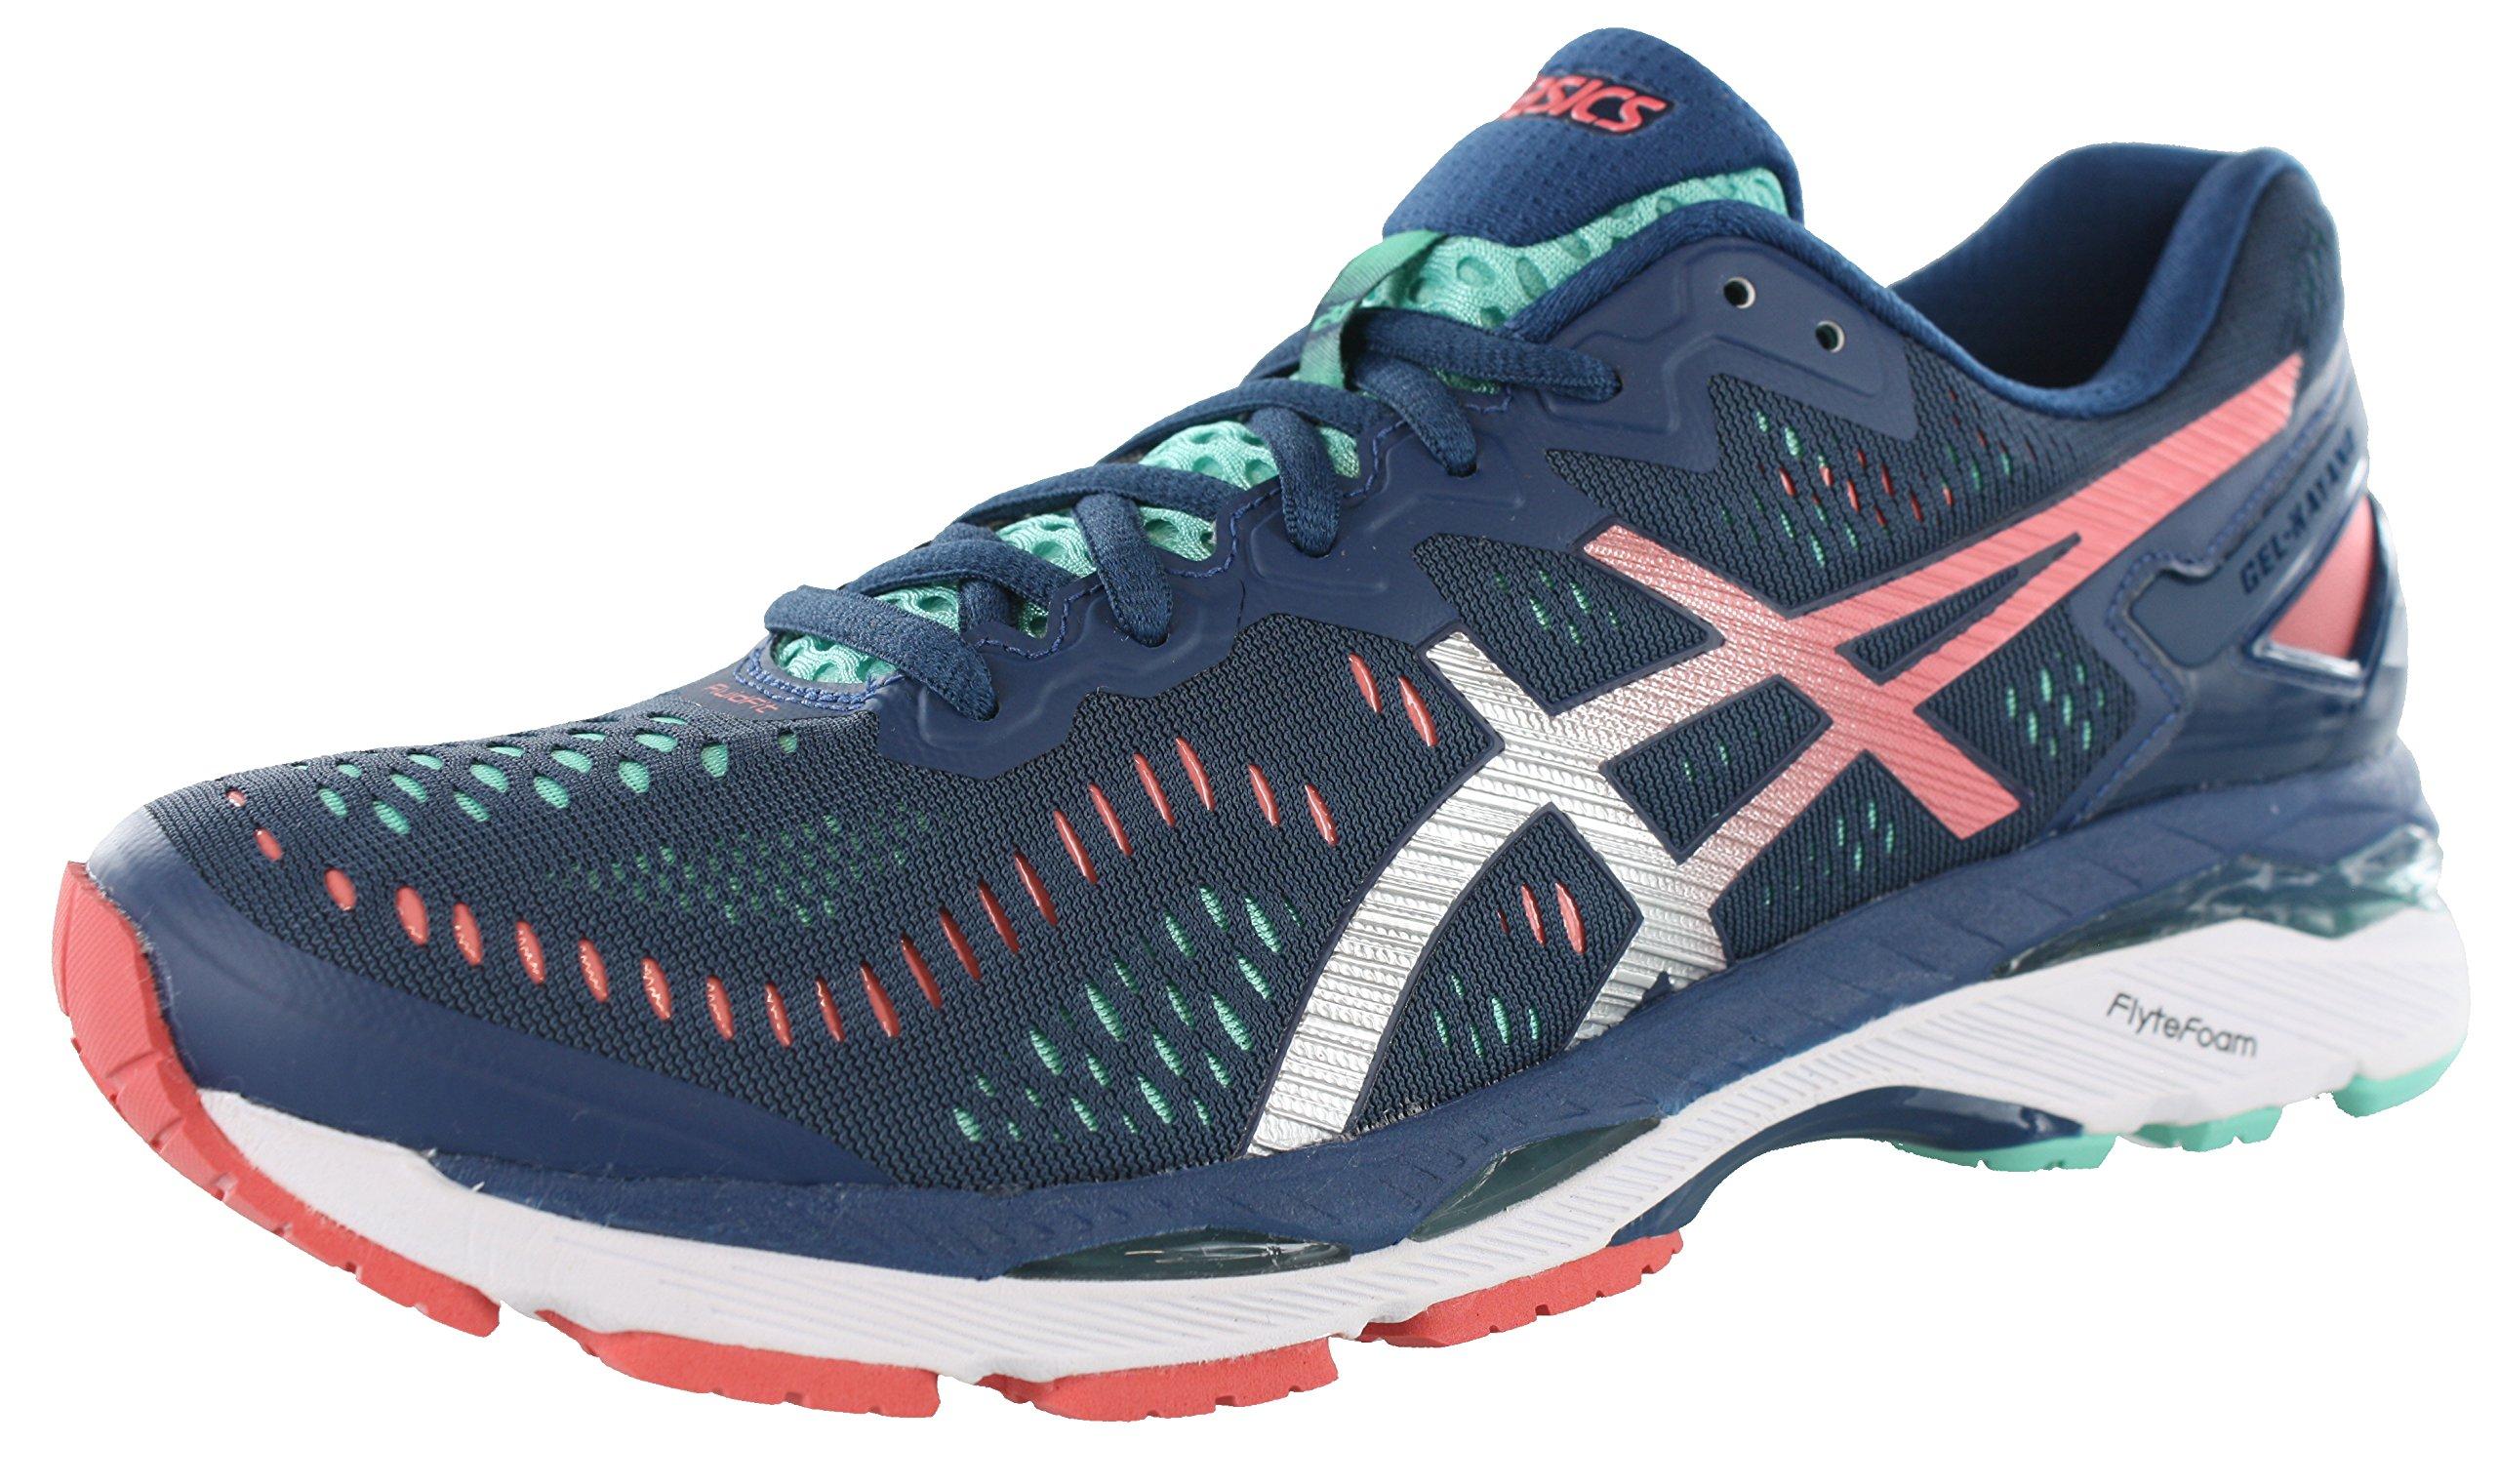 ASICS Women's Gel-Kayano 23 Running Shoe, Poseidon/Silver/Cockatoo, 9 M US